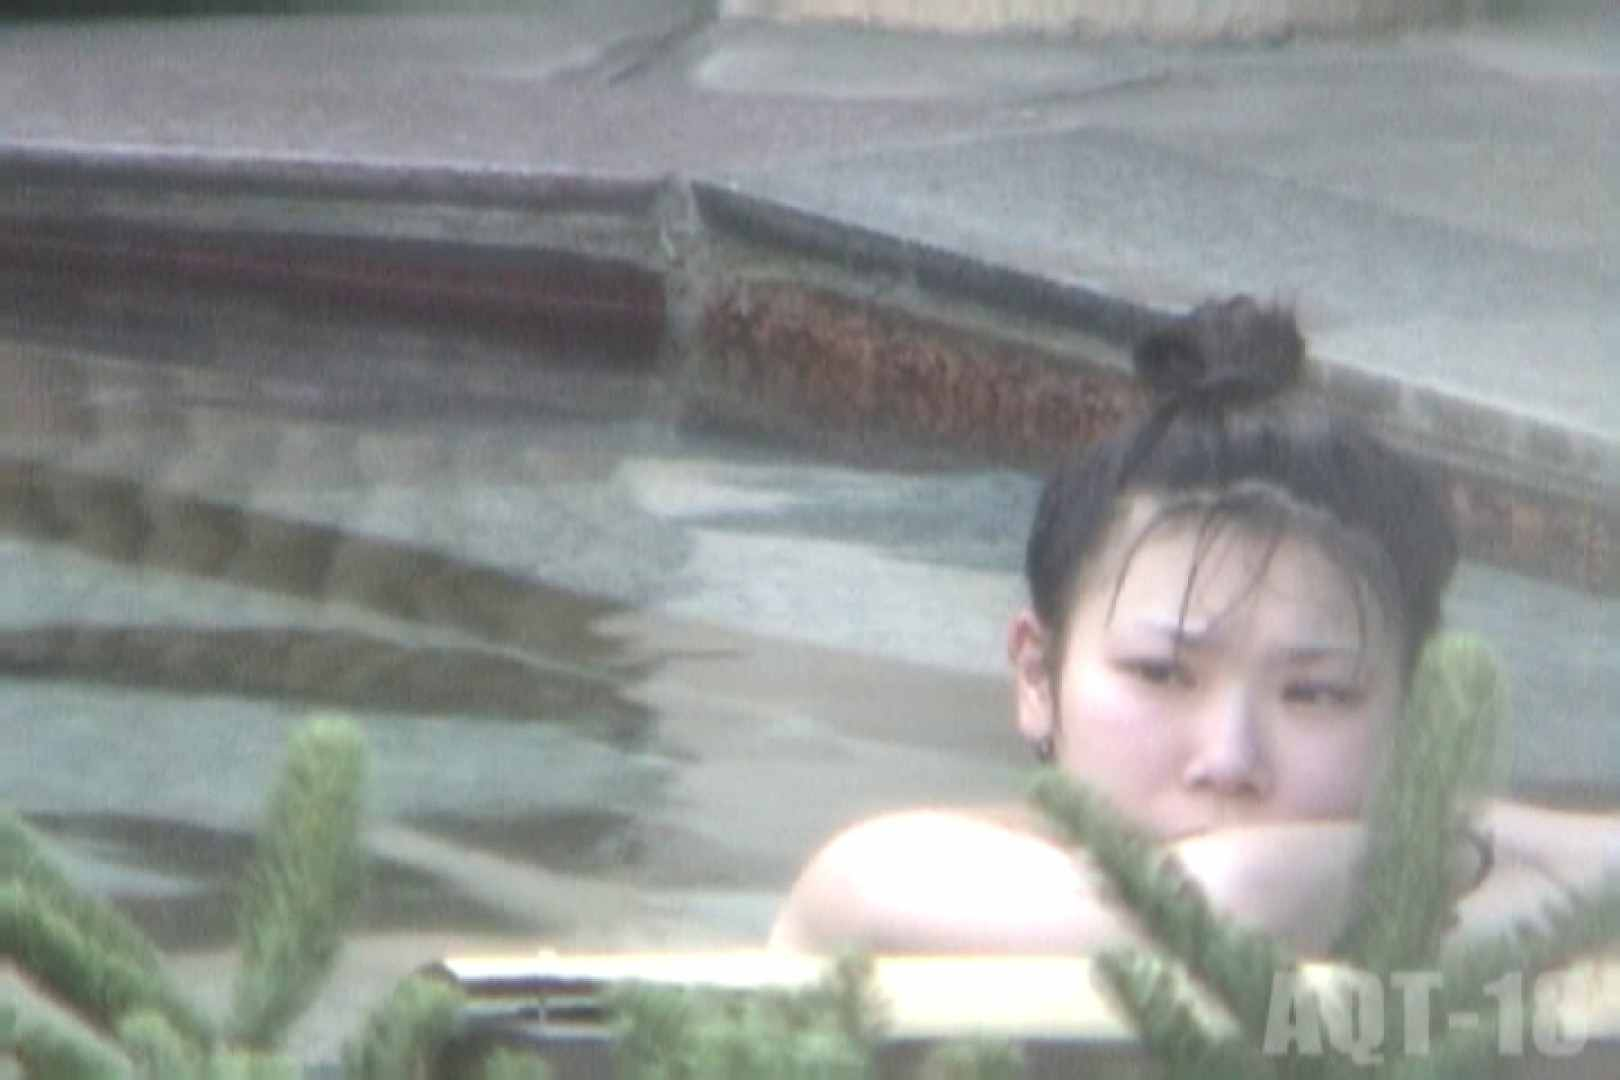 Aquaな露天風呂Vol.855 露天風呂編  86PIX 82